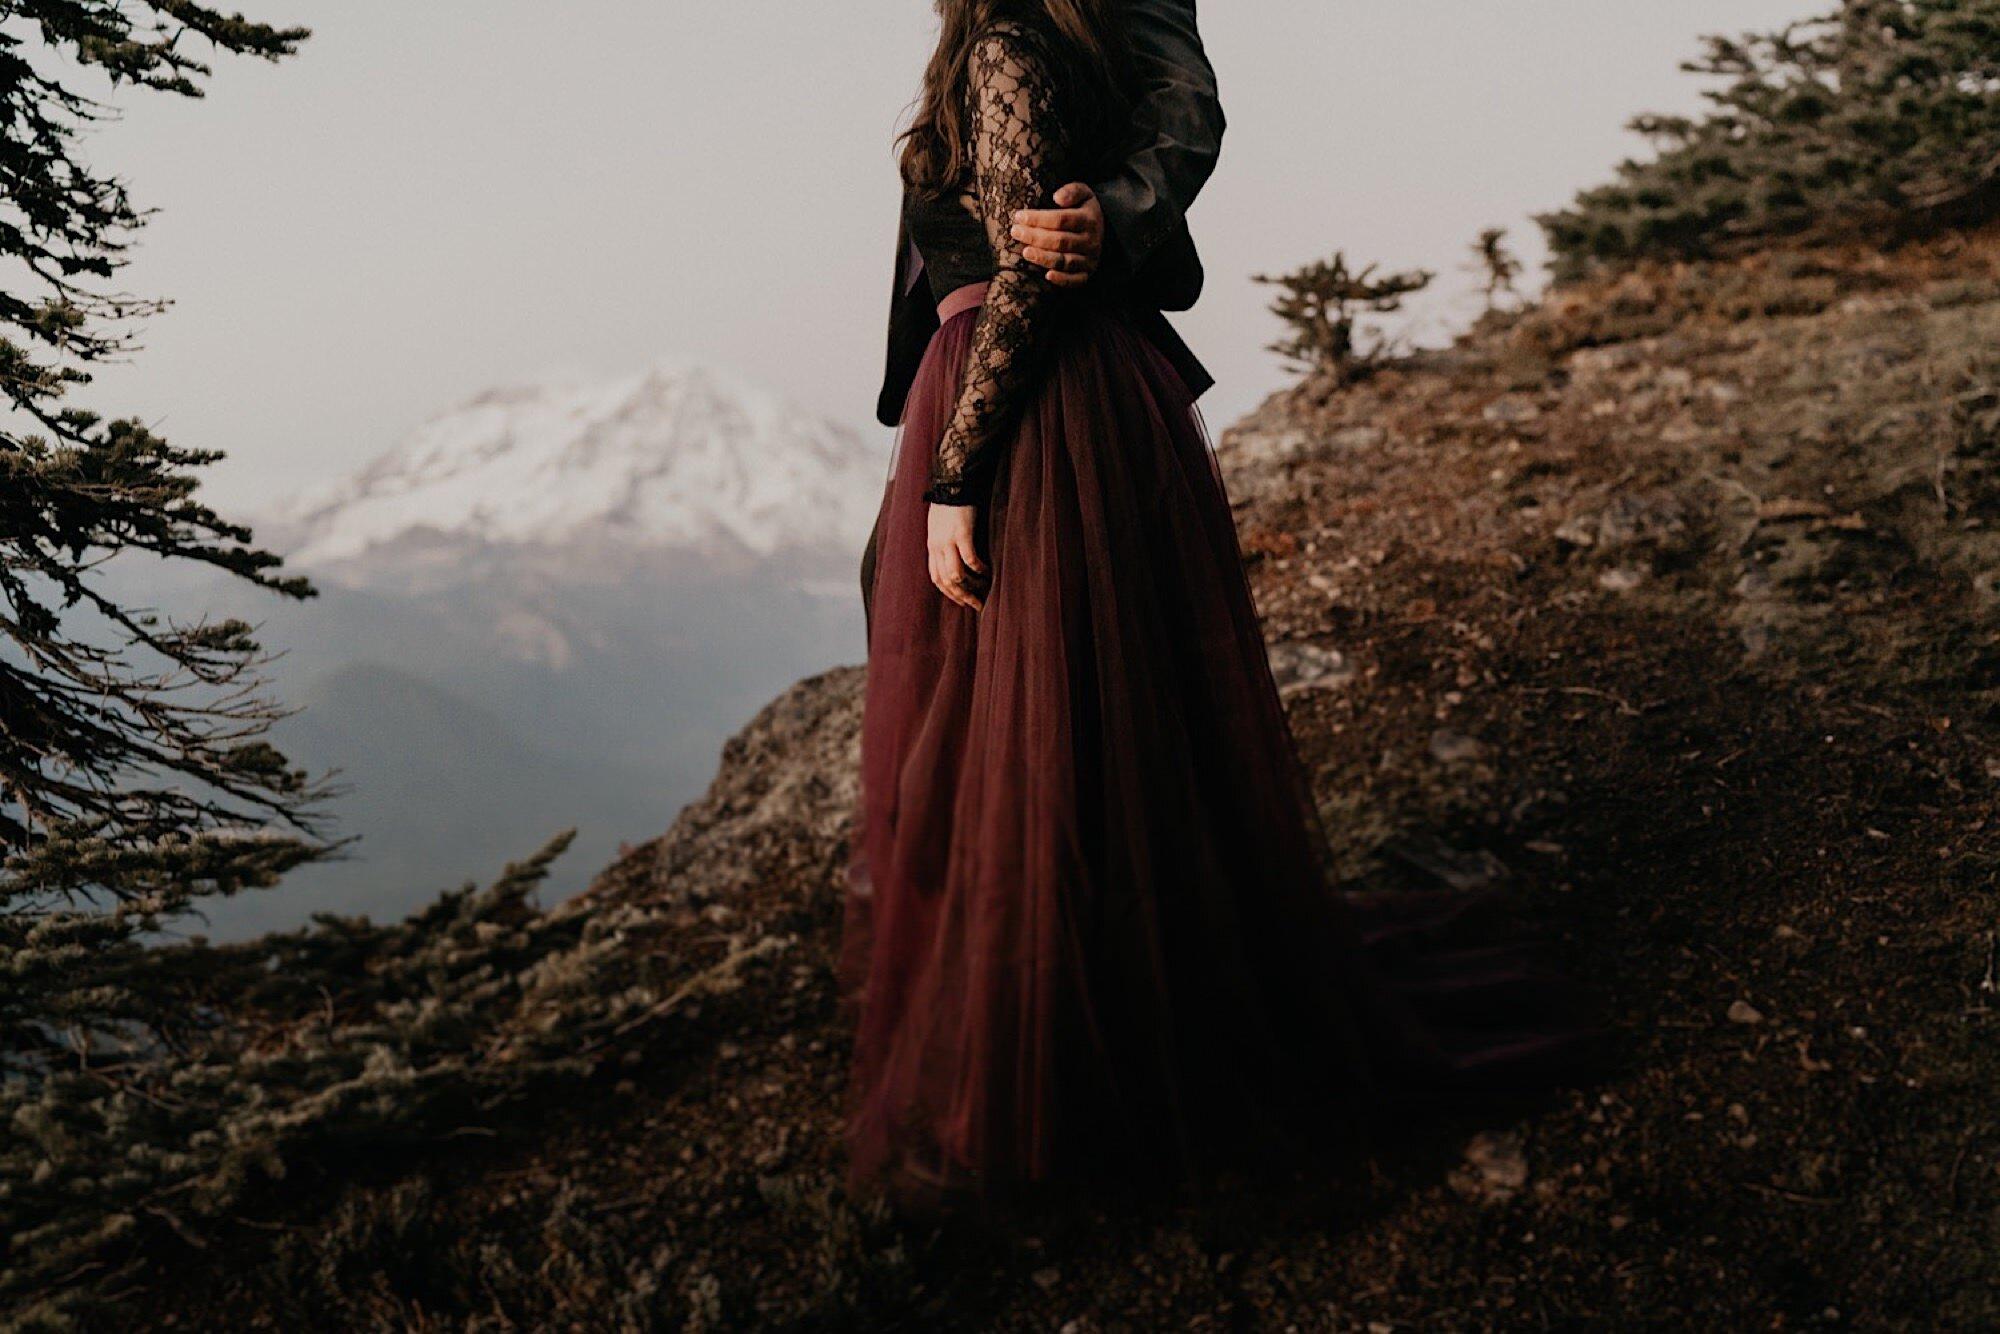 mount-rainier-hiking-adventure-elopement-18.jpg